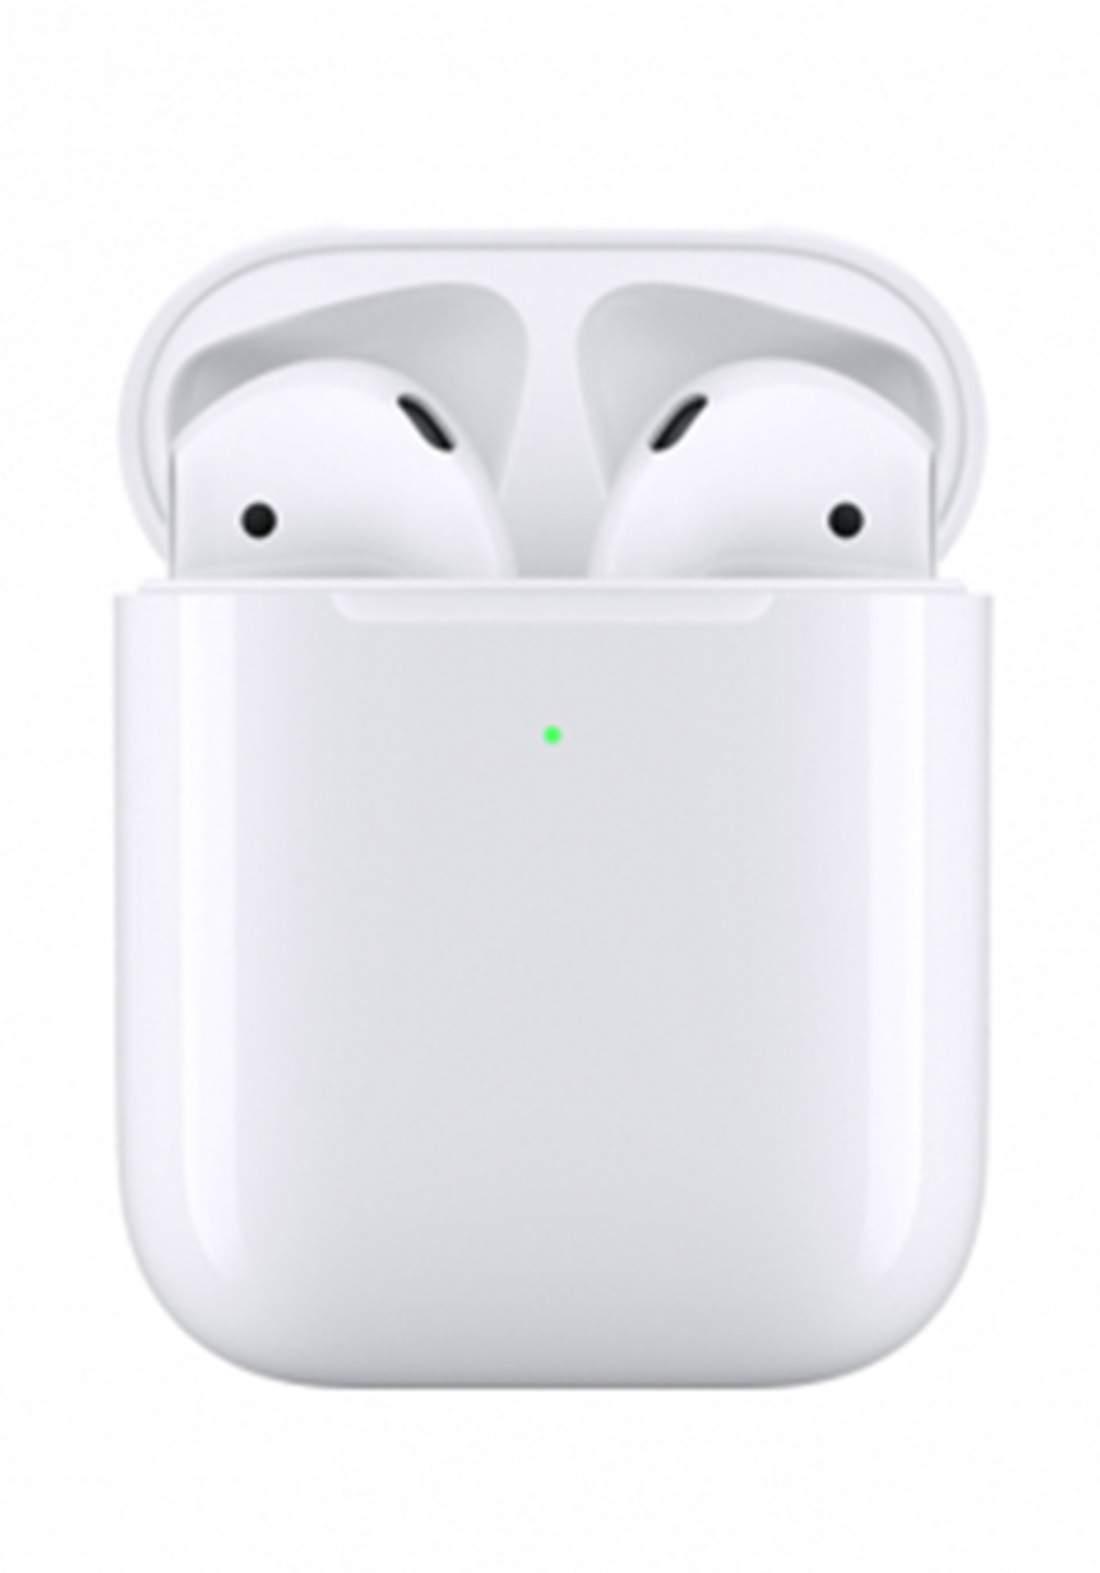 WIWU Airbuds Light Sensor True Wireless Stereo - White